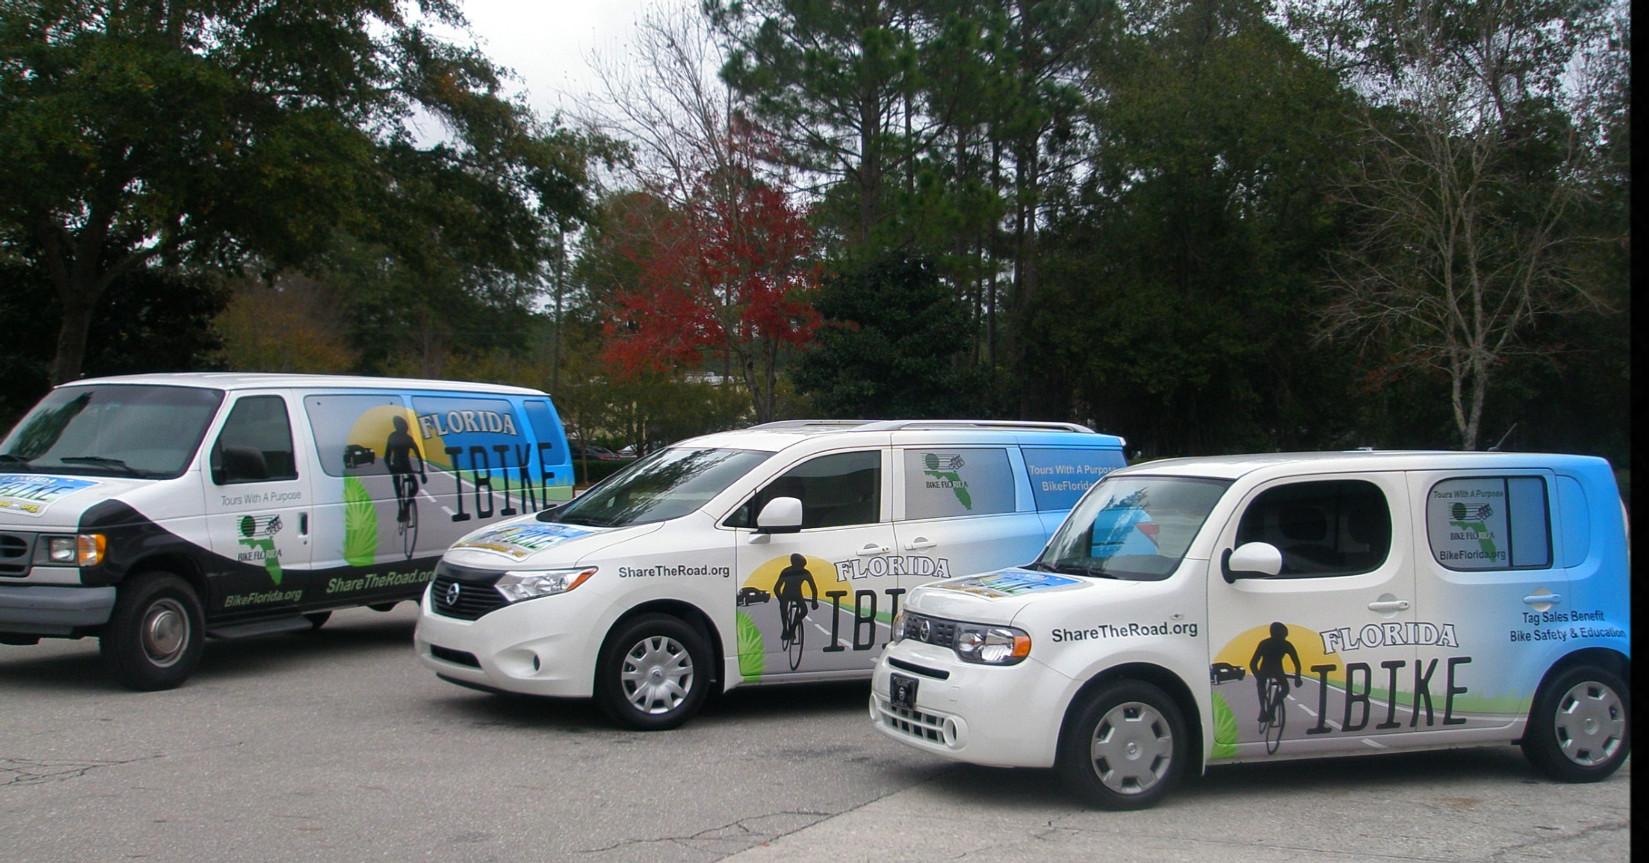 fleet graphics, partial vehicle wraps